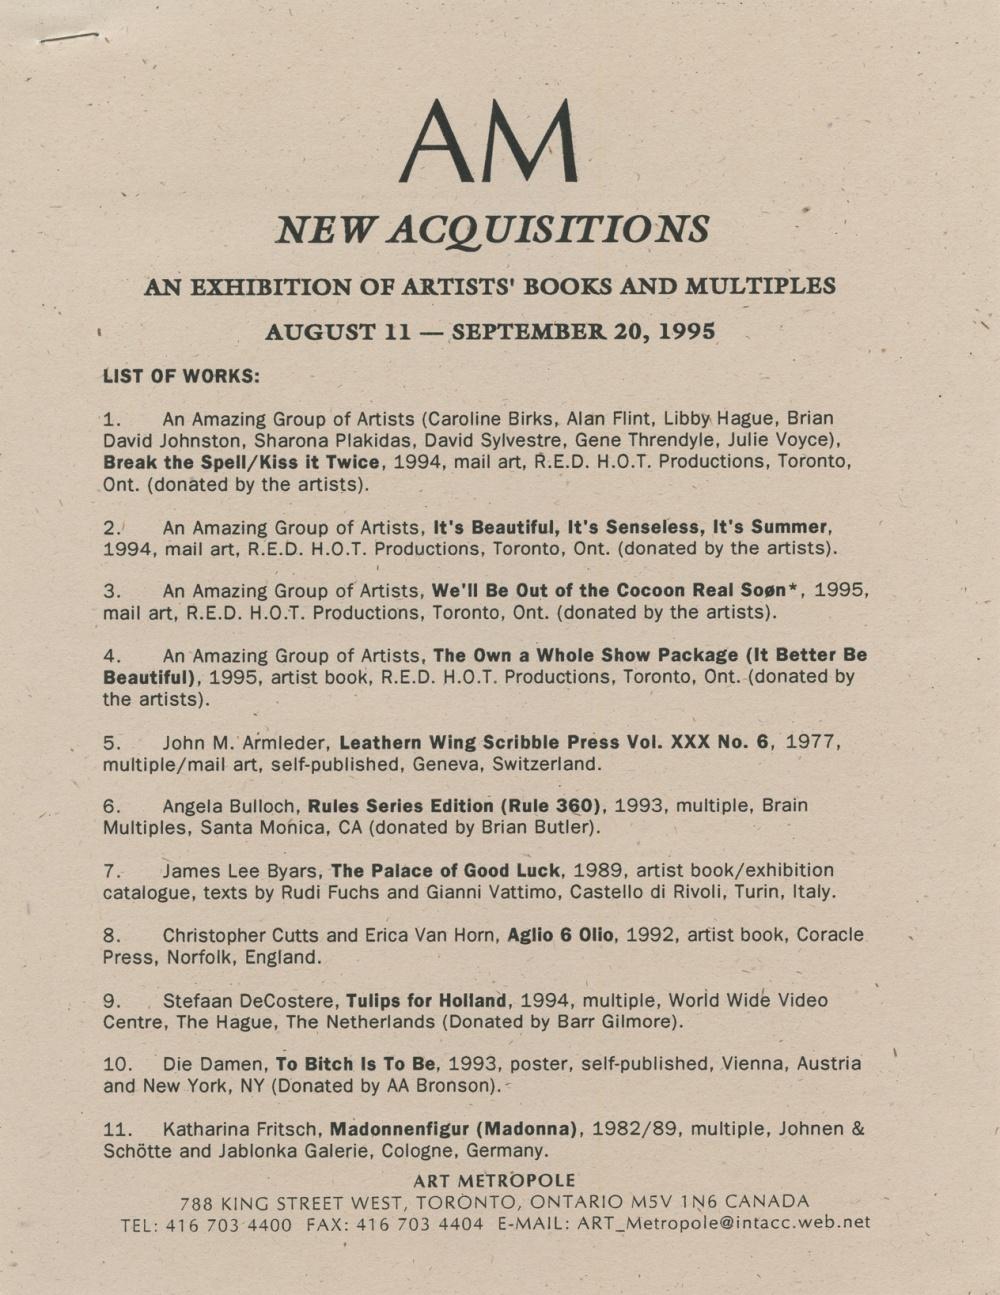 AMA9507.1, page 1